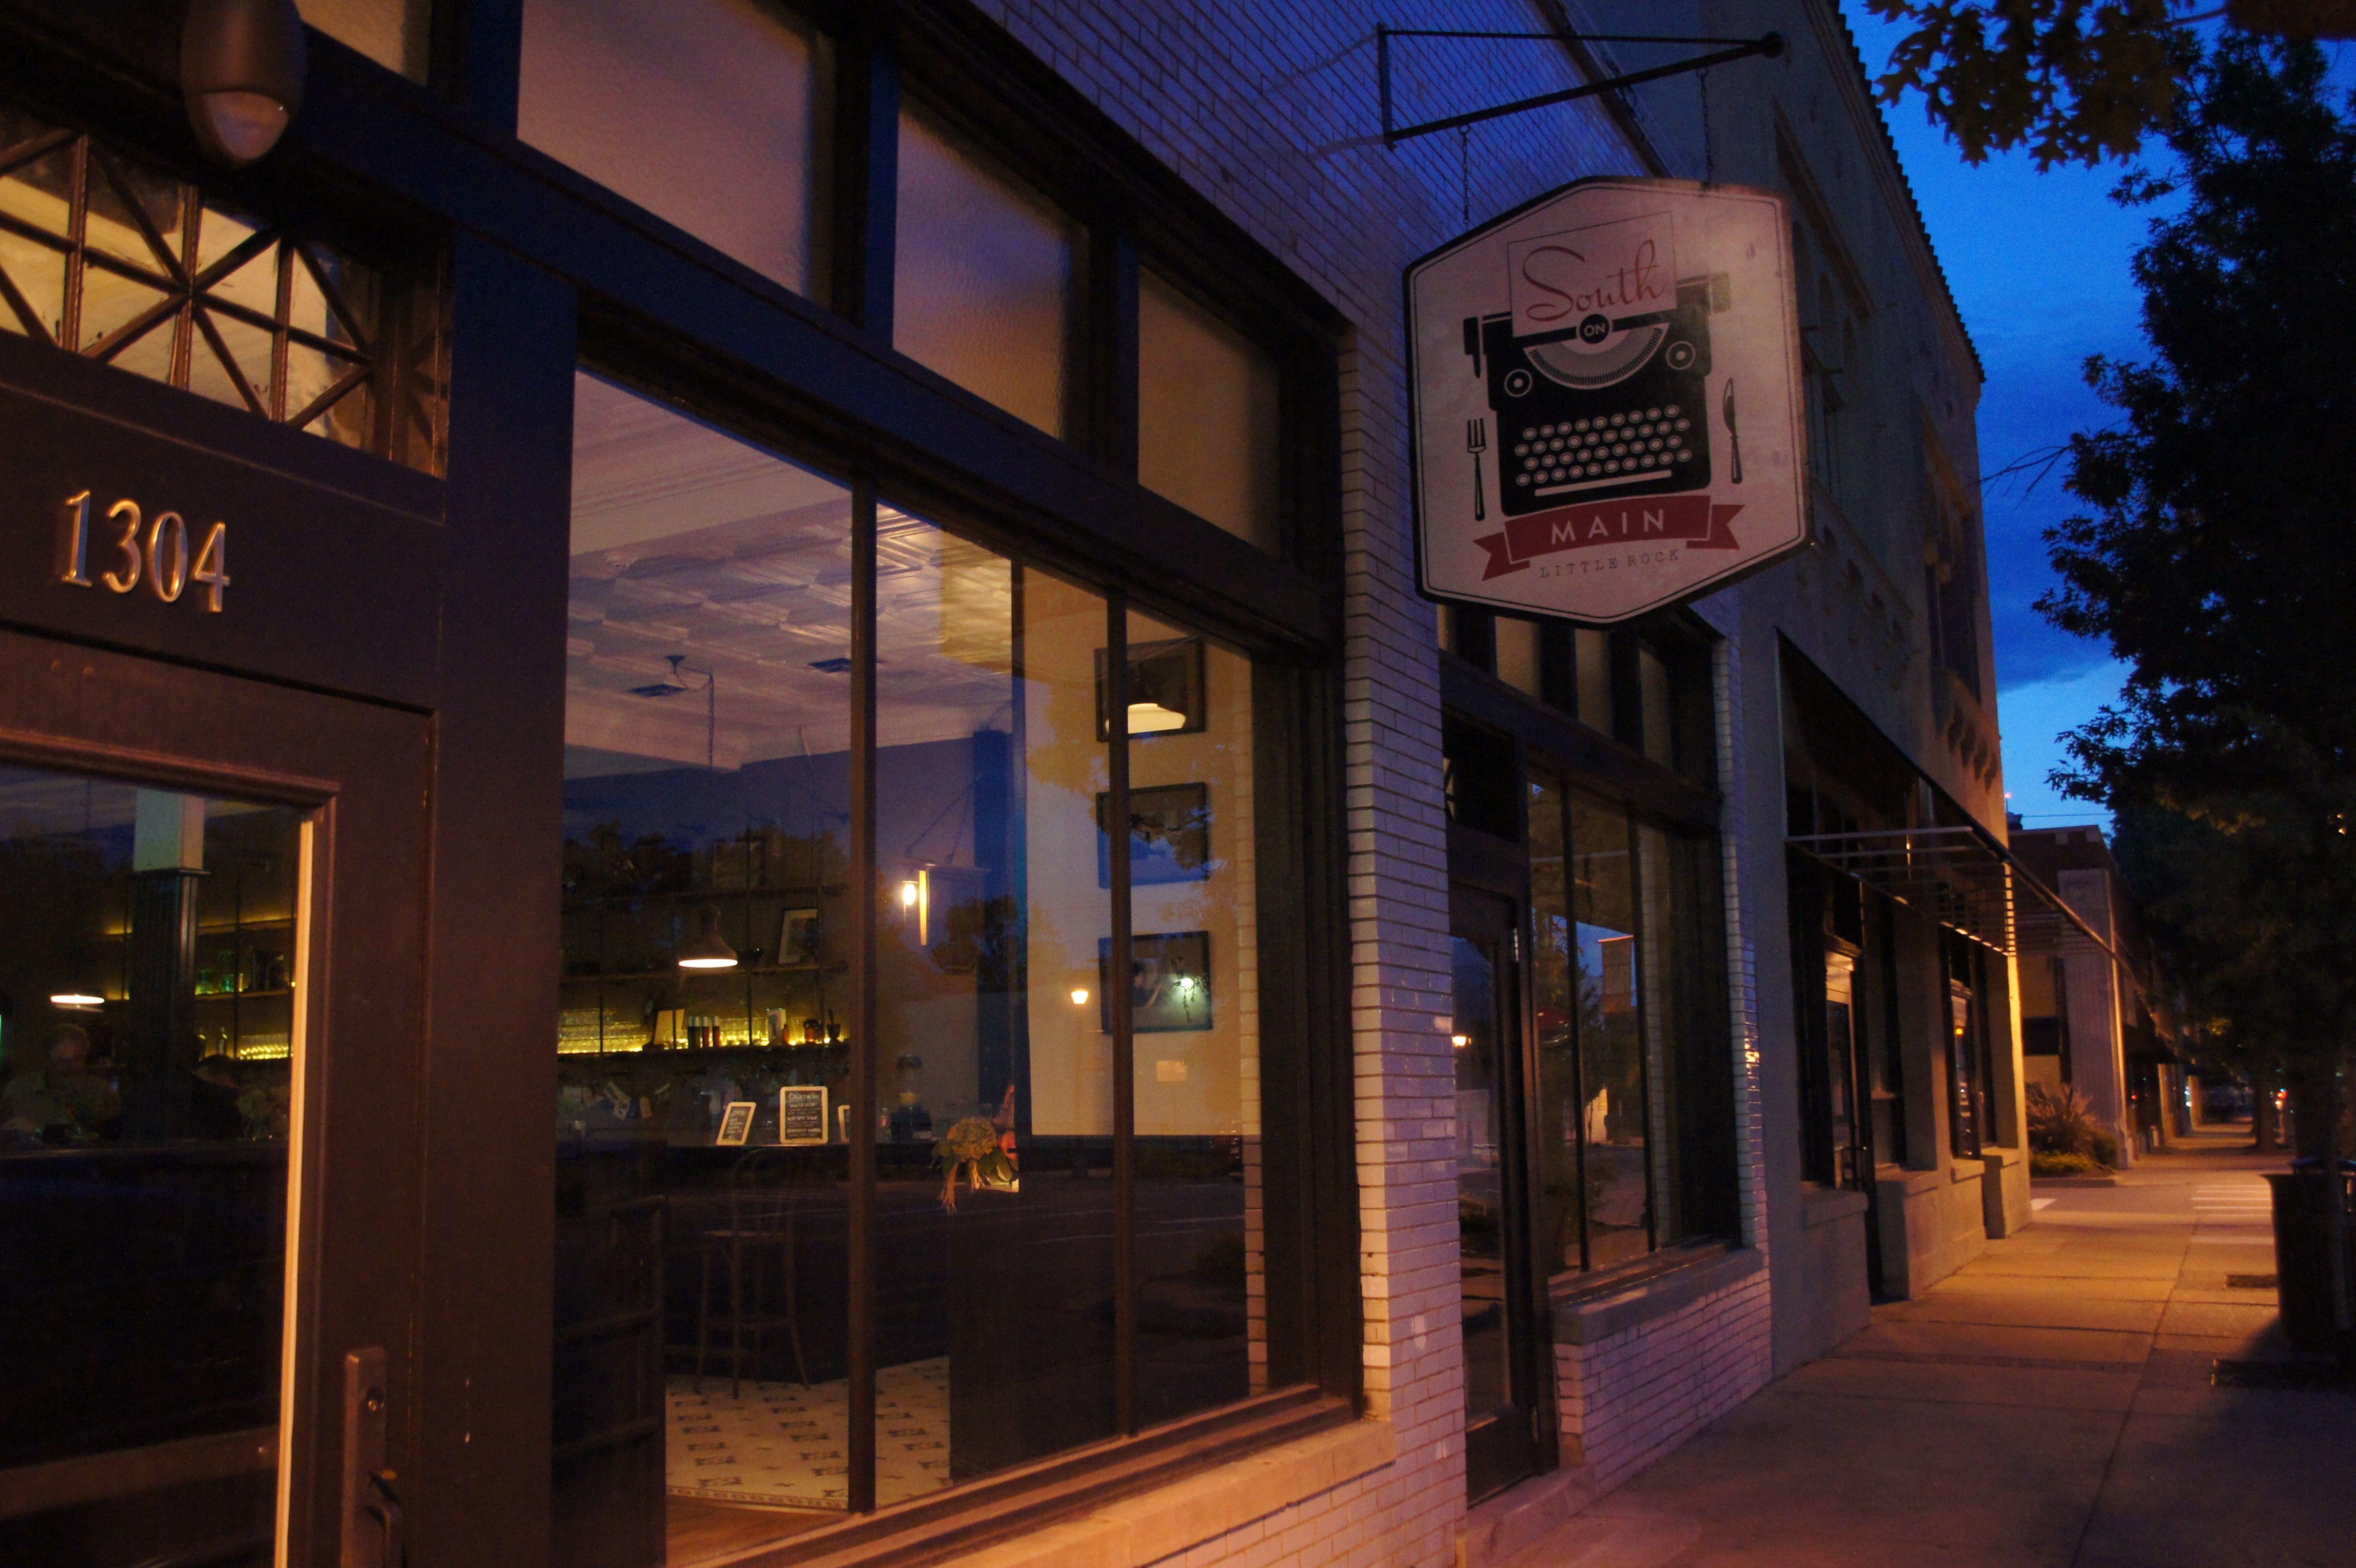 My New Favorite Restaurant In Little Rock Arkansas Is South On